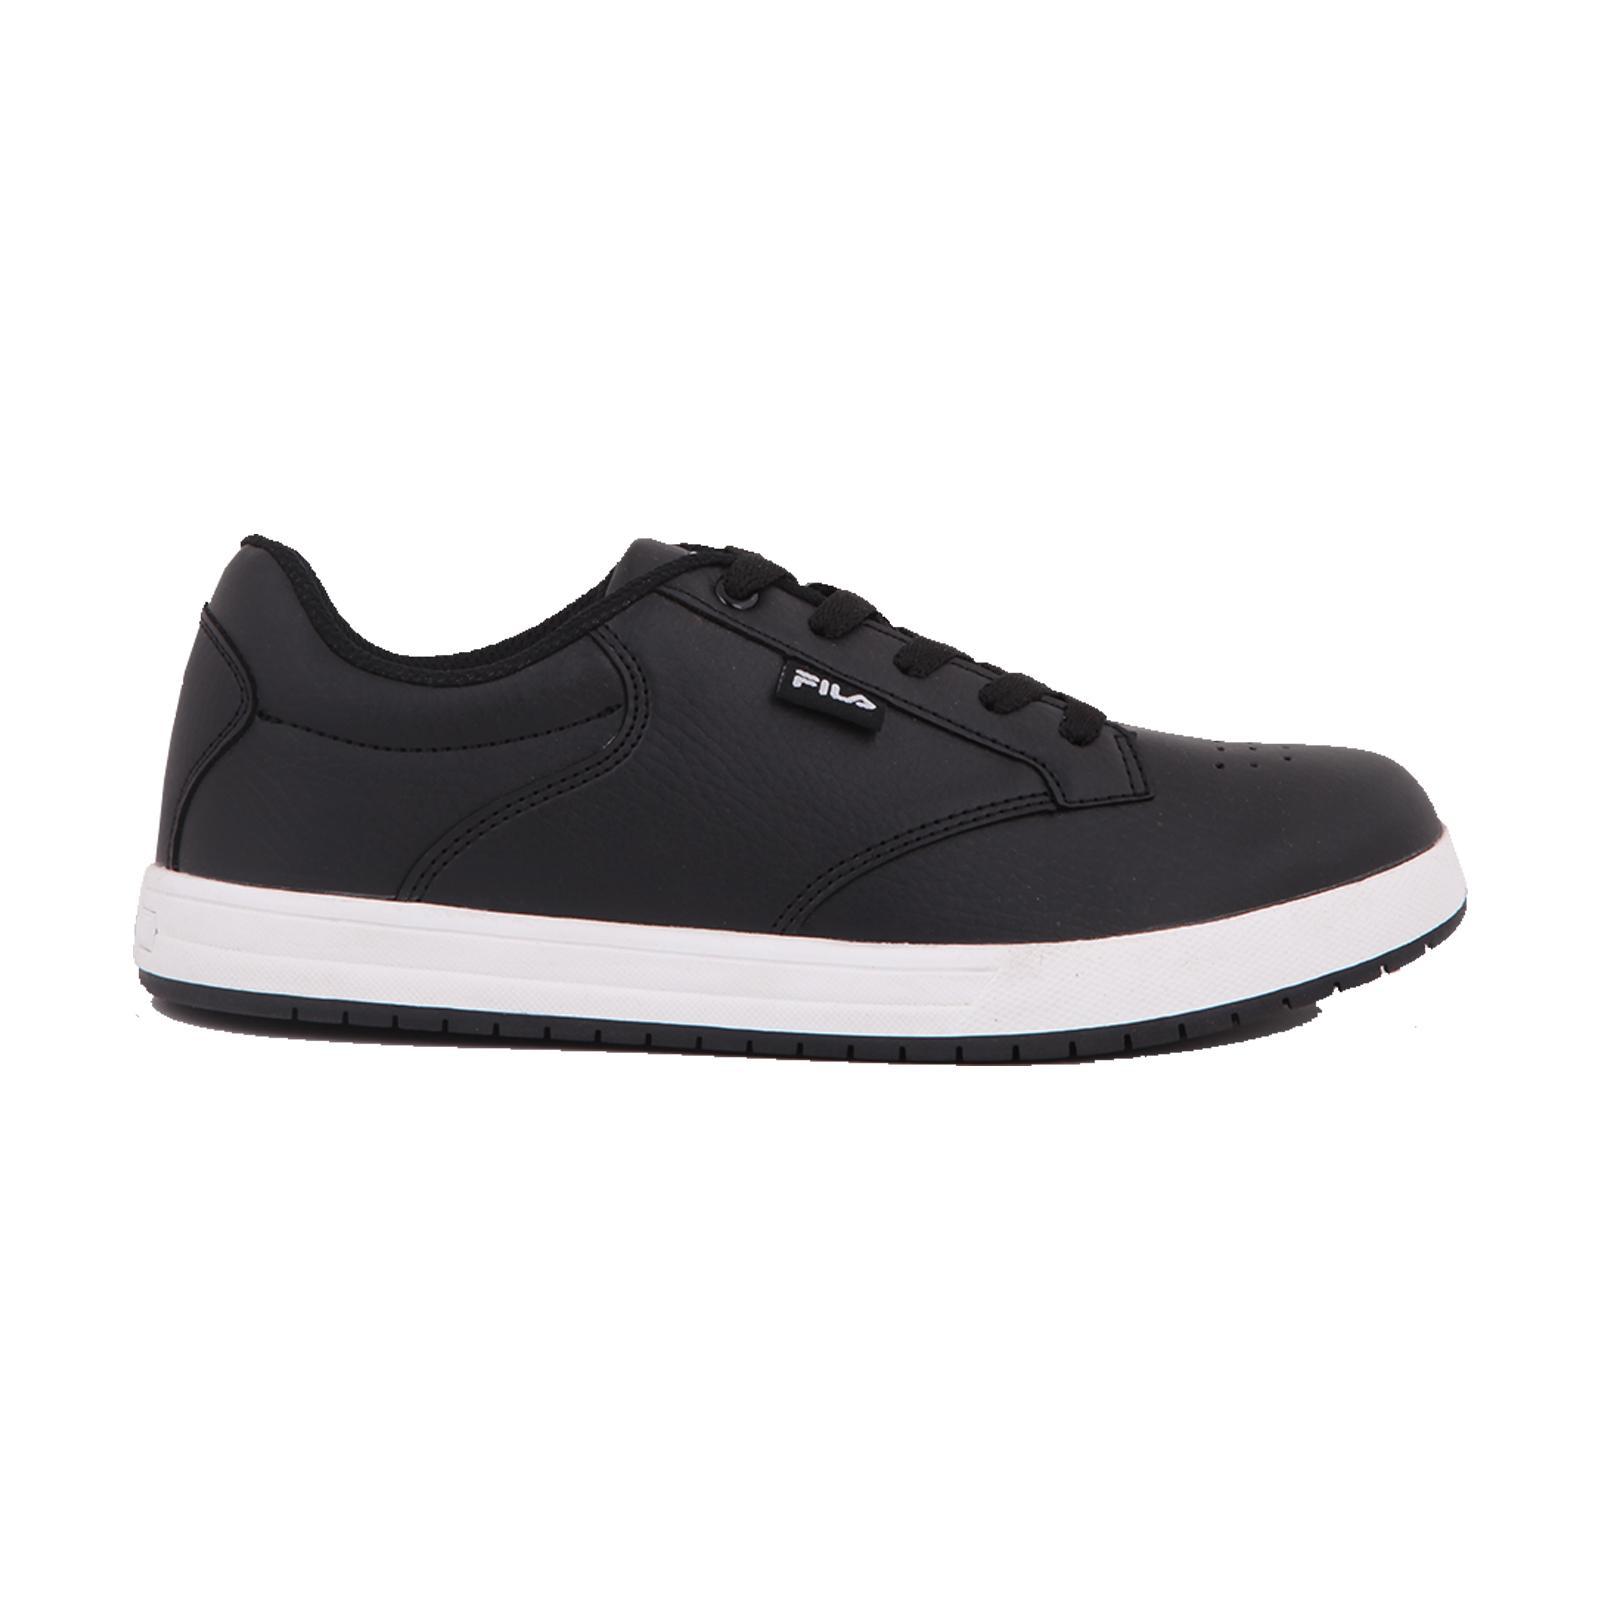 Fila Sepatu Lifestyle Friday